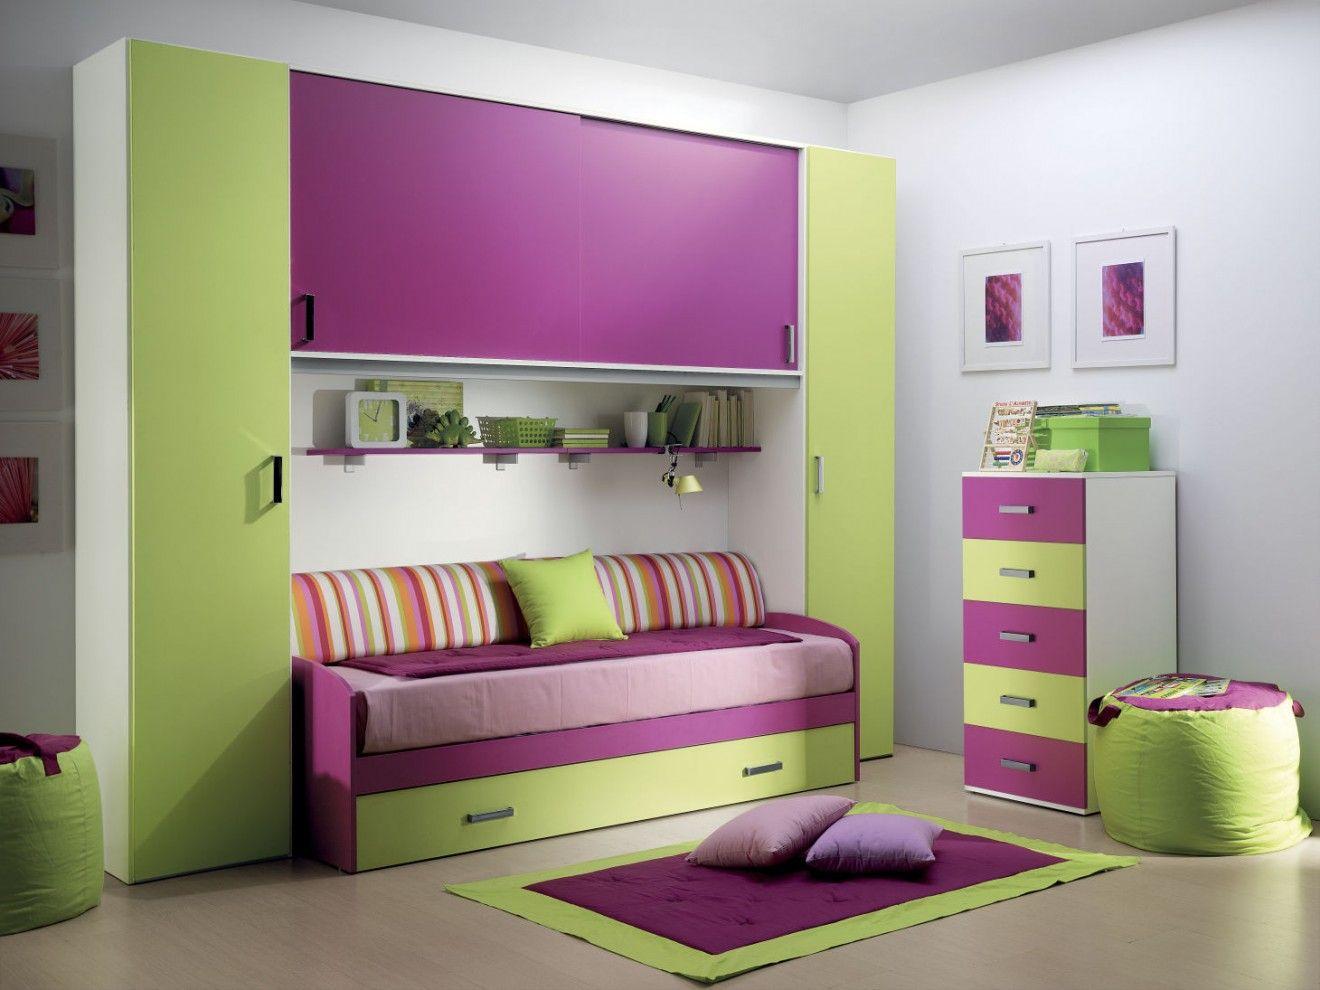 Cameretta rosa ~ Cameretta a ponte rachele furnishing bedroom camerette design